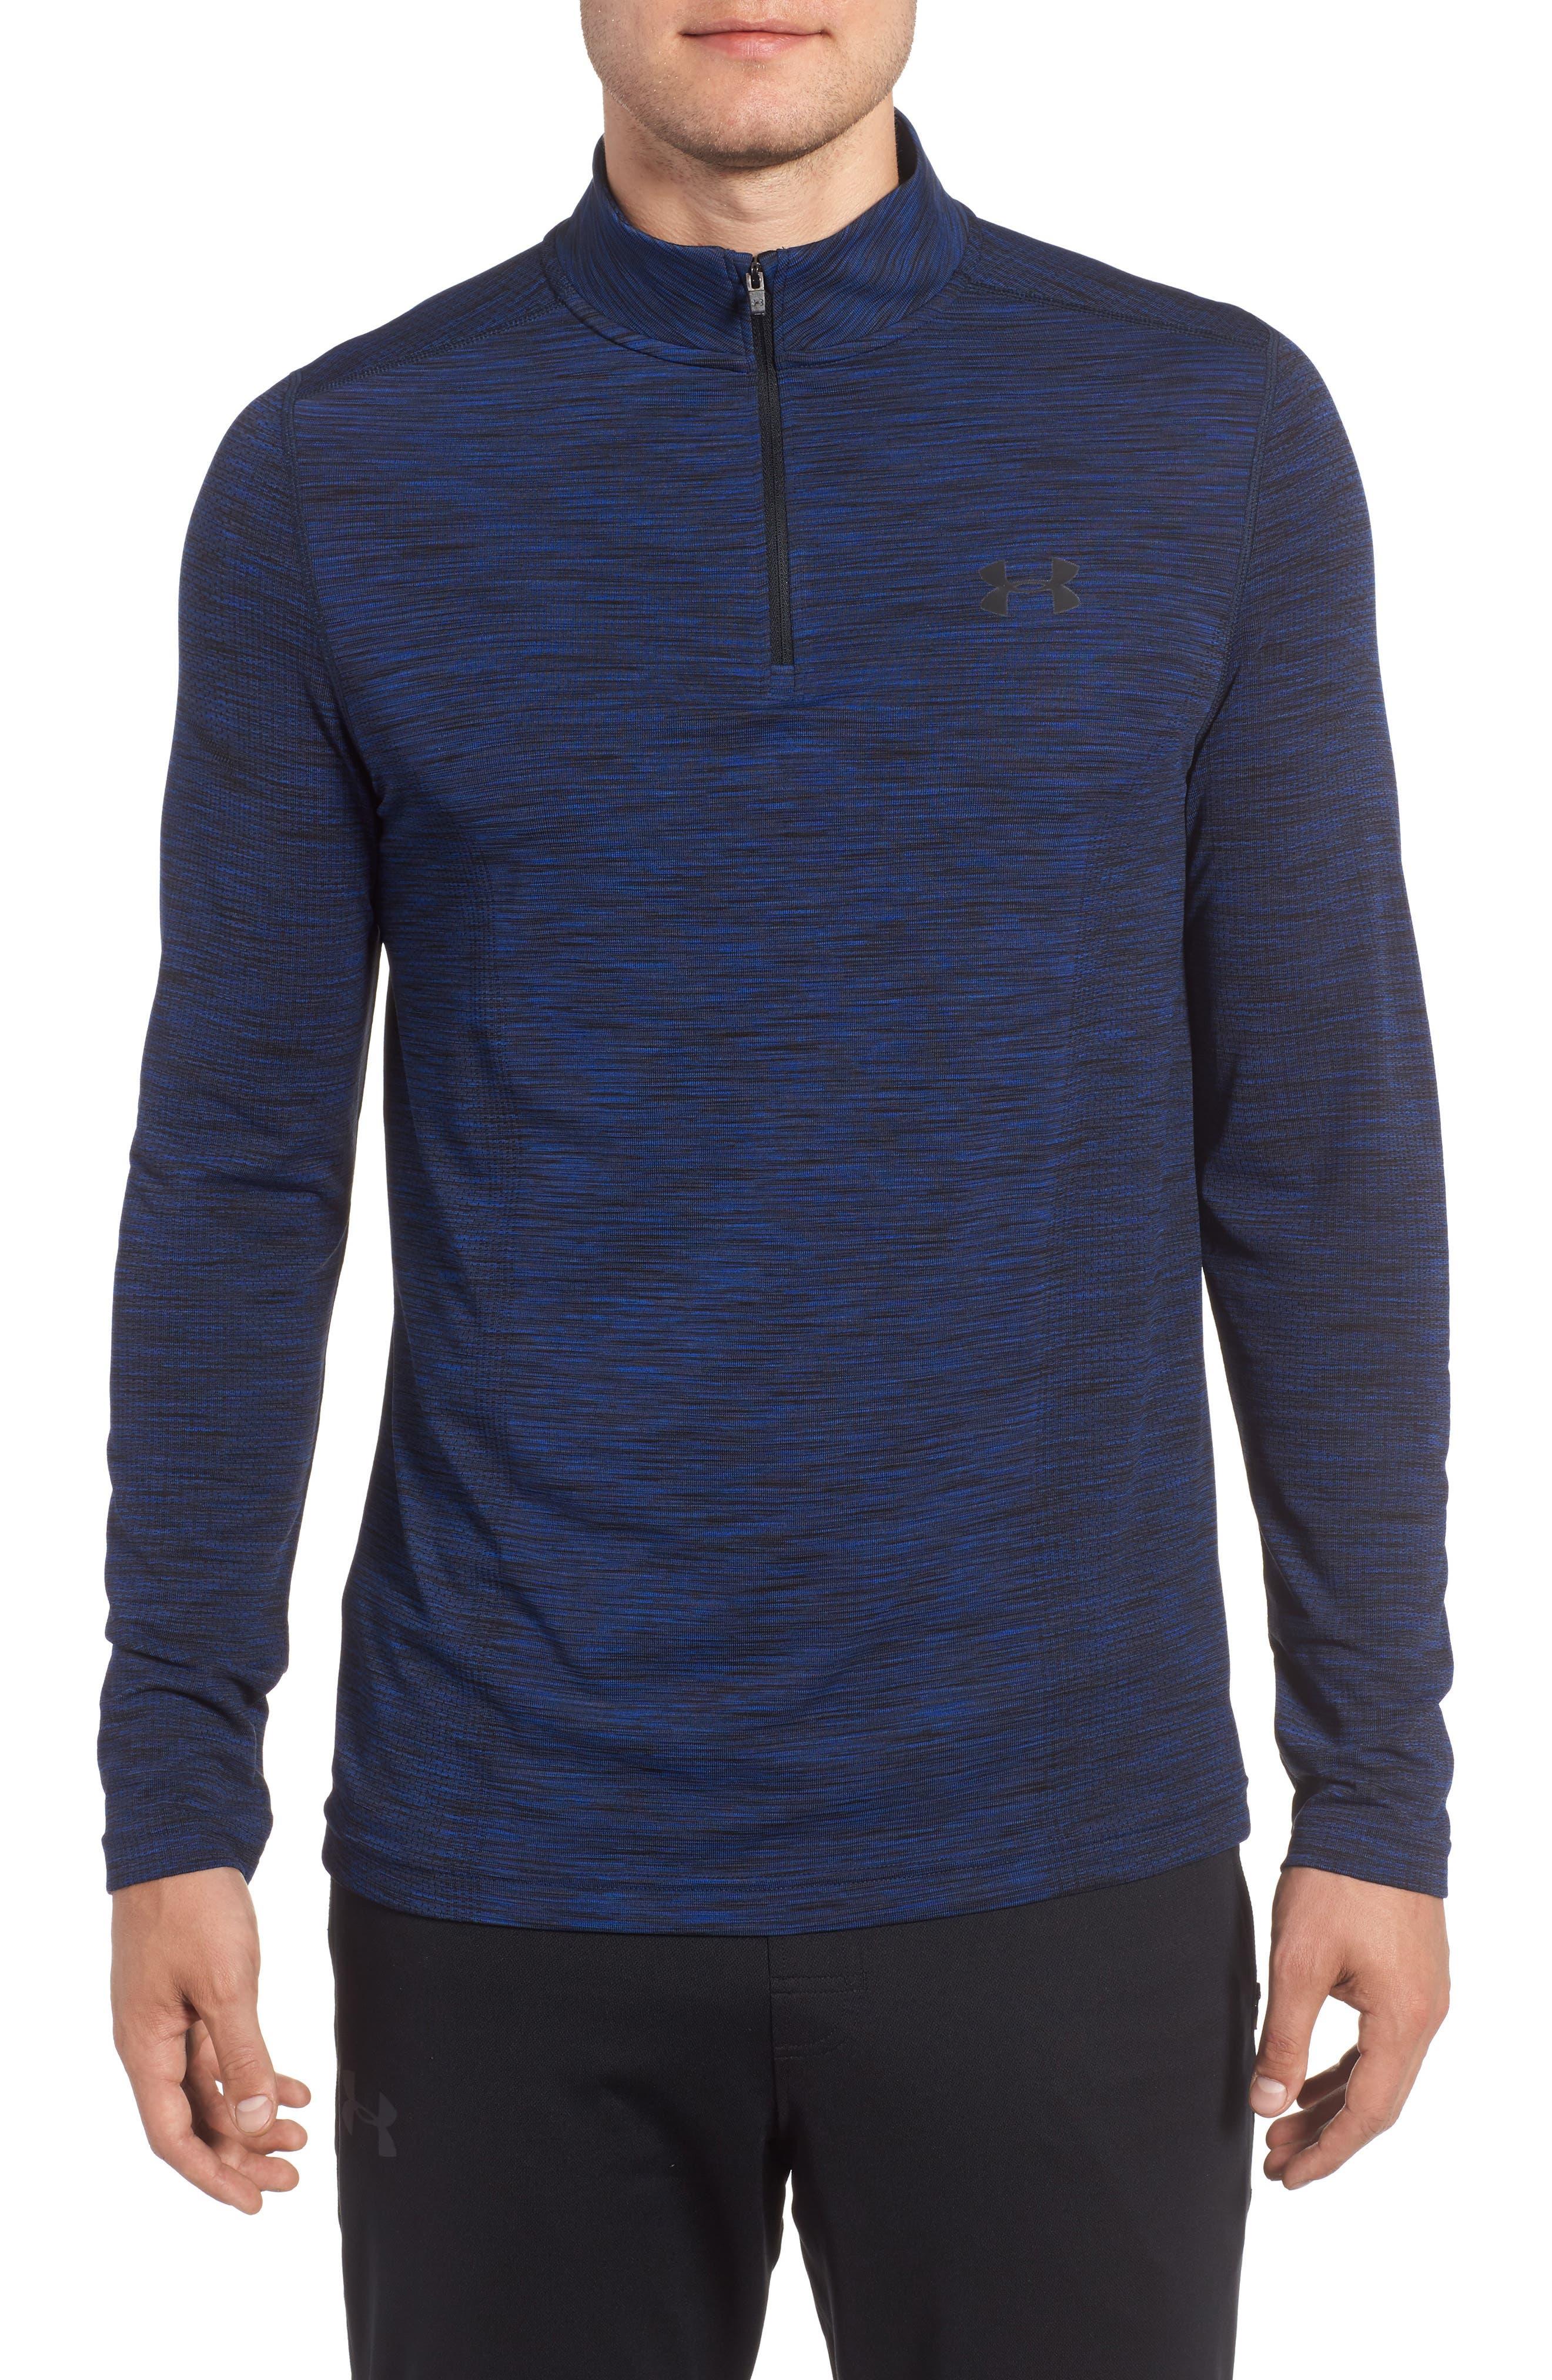 Threadborne Seamless Quarter Zip Pullover,                             Main thumbnail 1, color,                             Blue